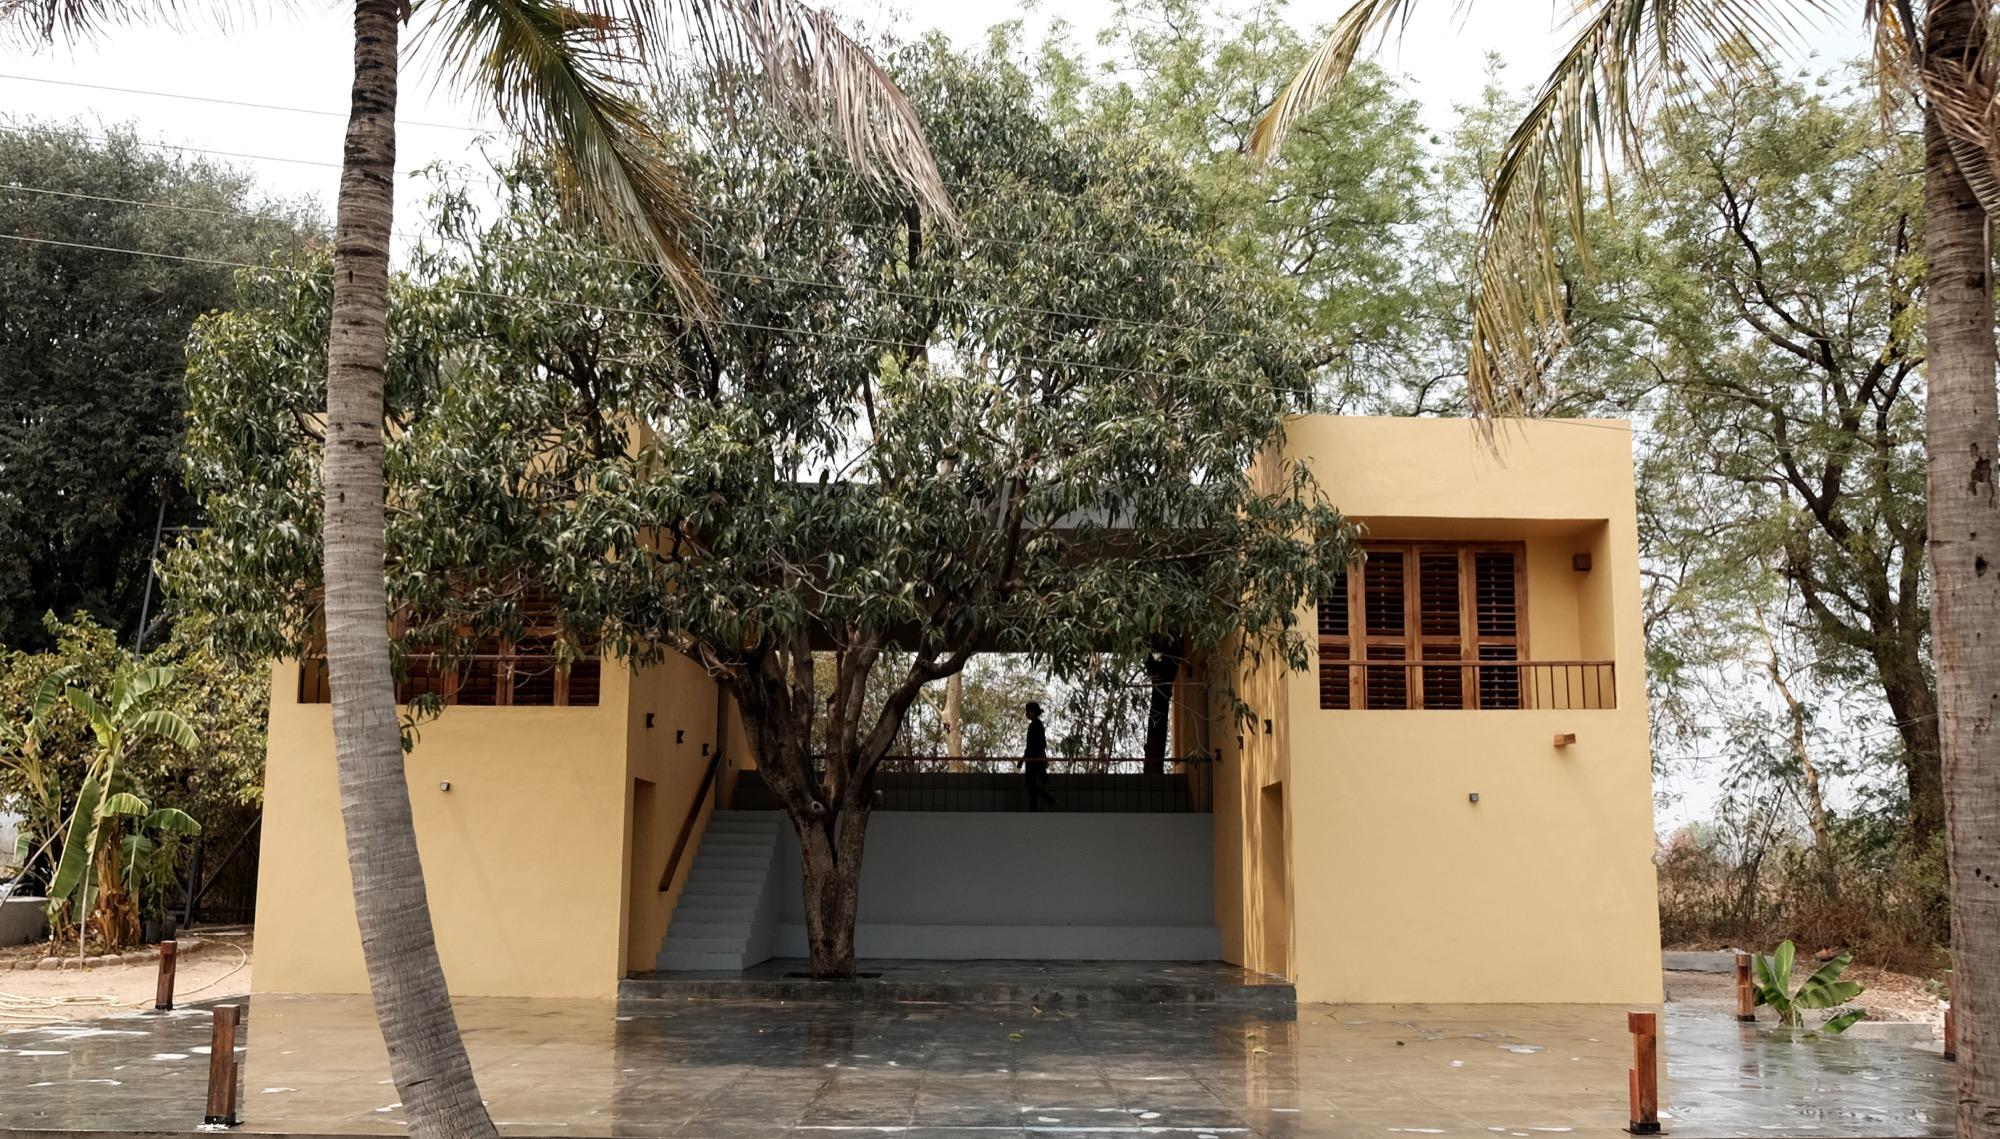 Mango Tree House at Saatnavri, Maharashtra, India by Samvad Design Studio, Bengaluru 119